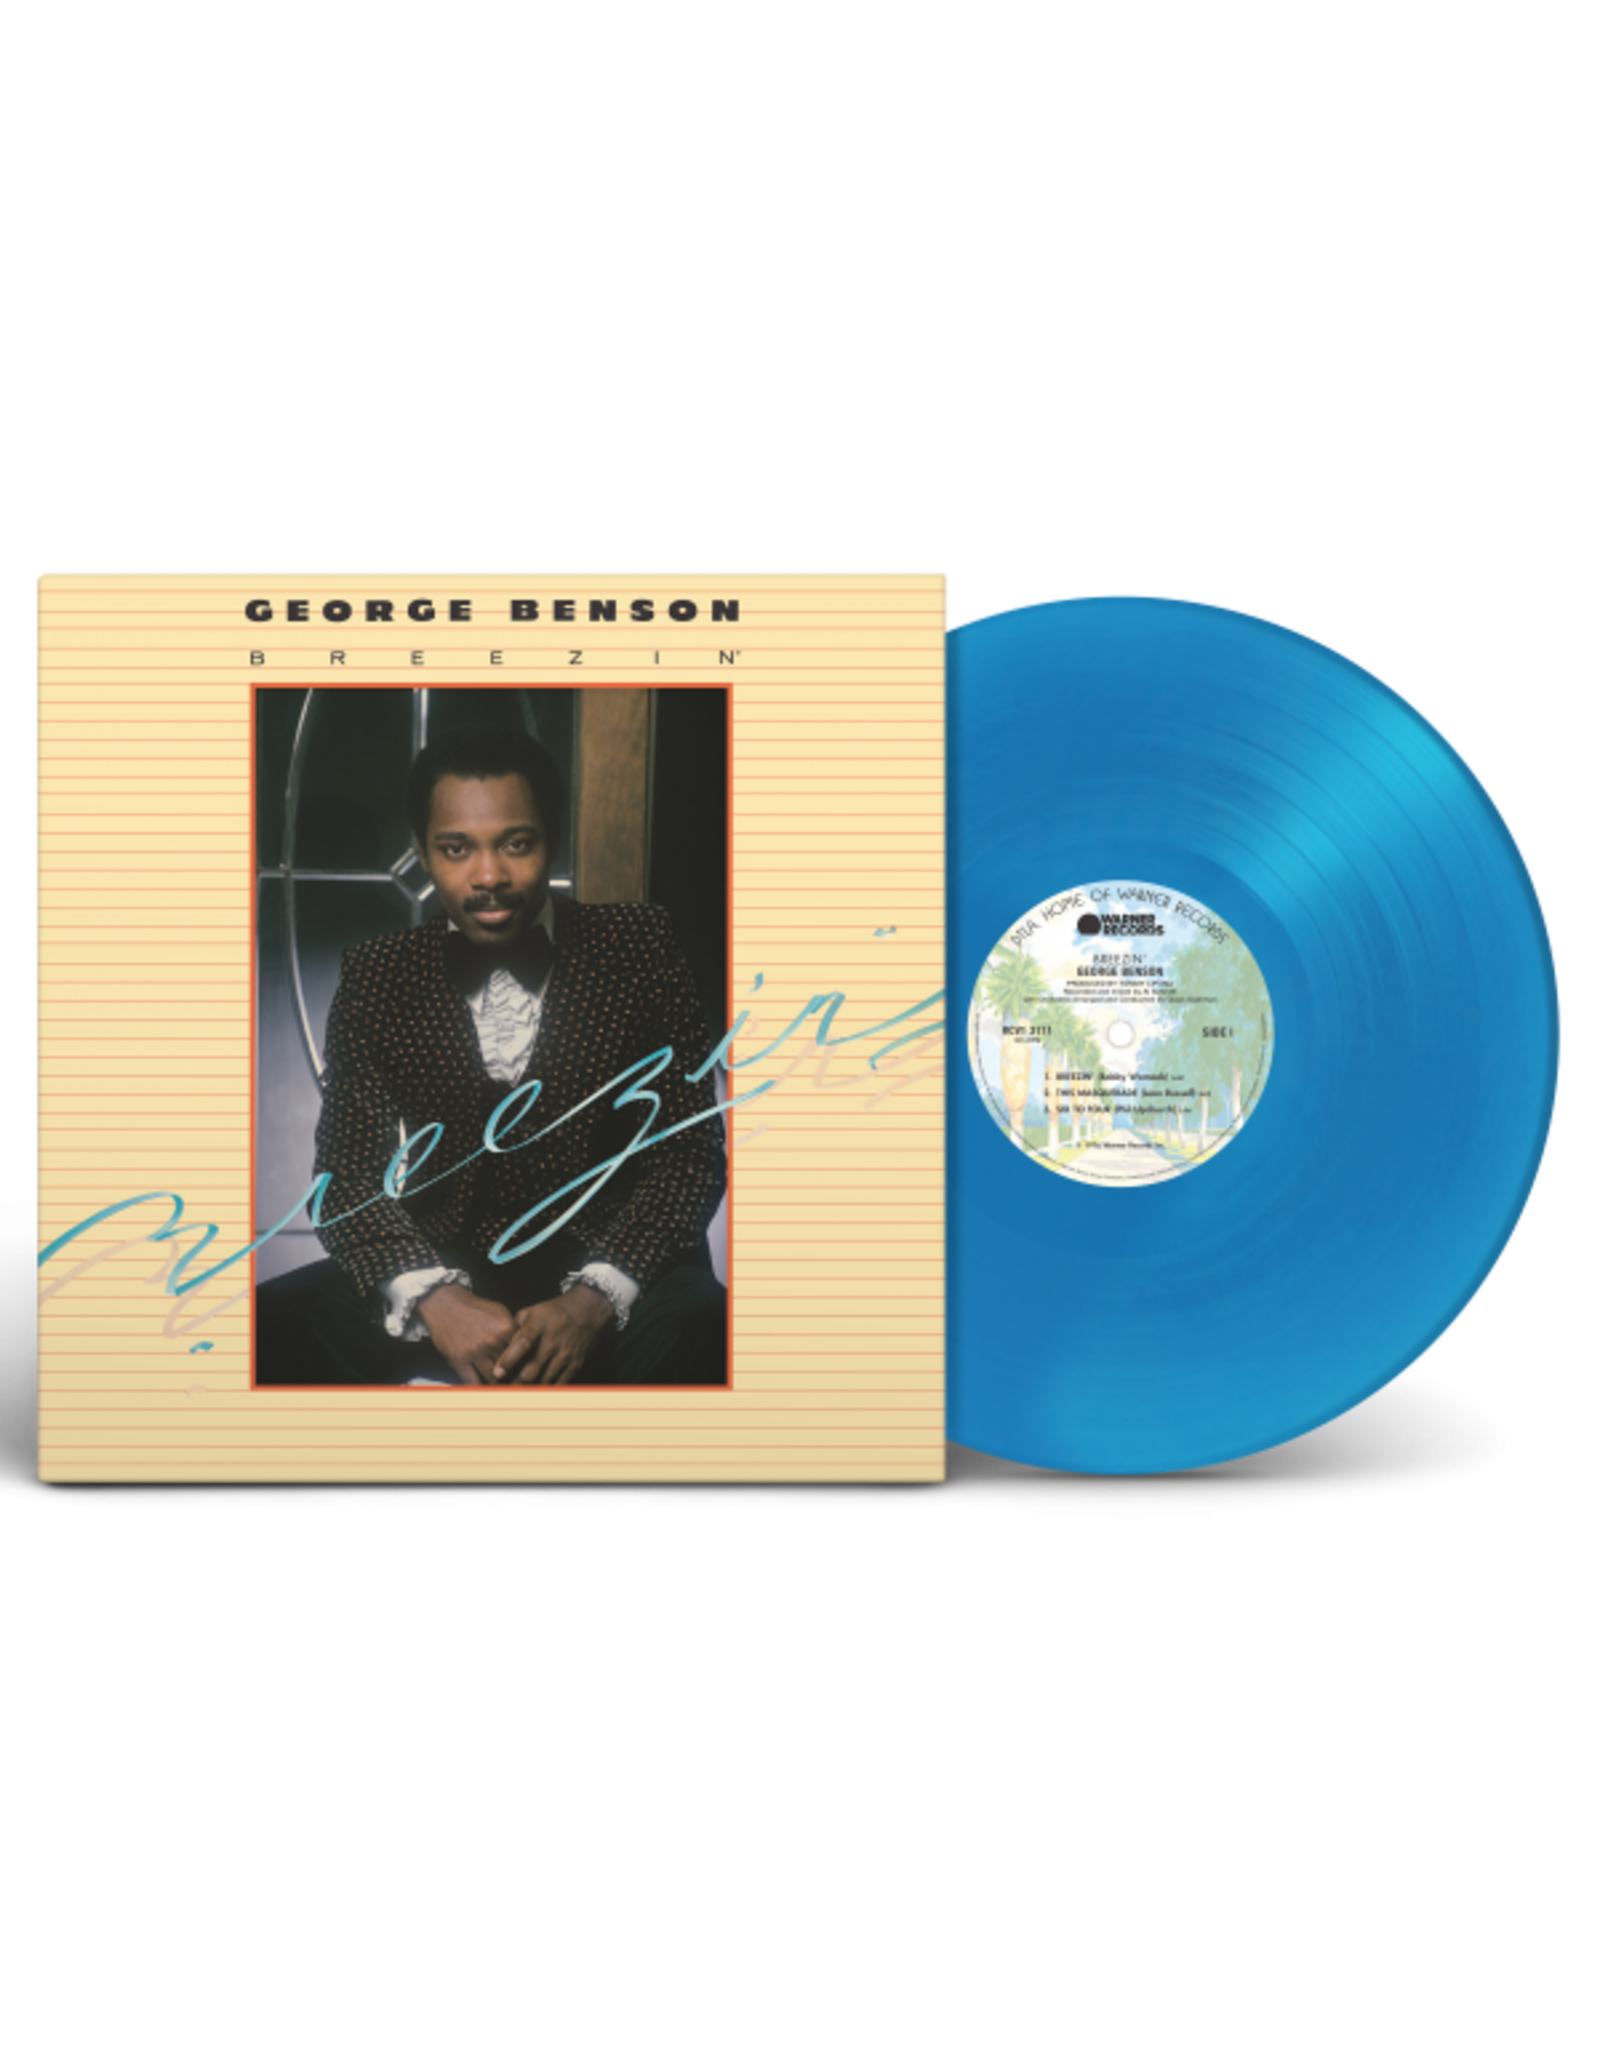 George Benson - Breezin' (Blue Vinyl)